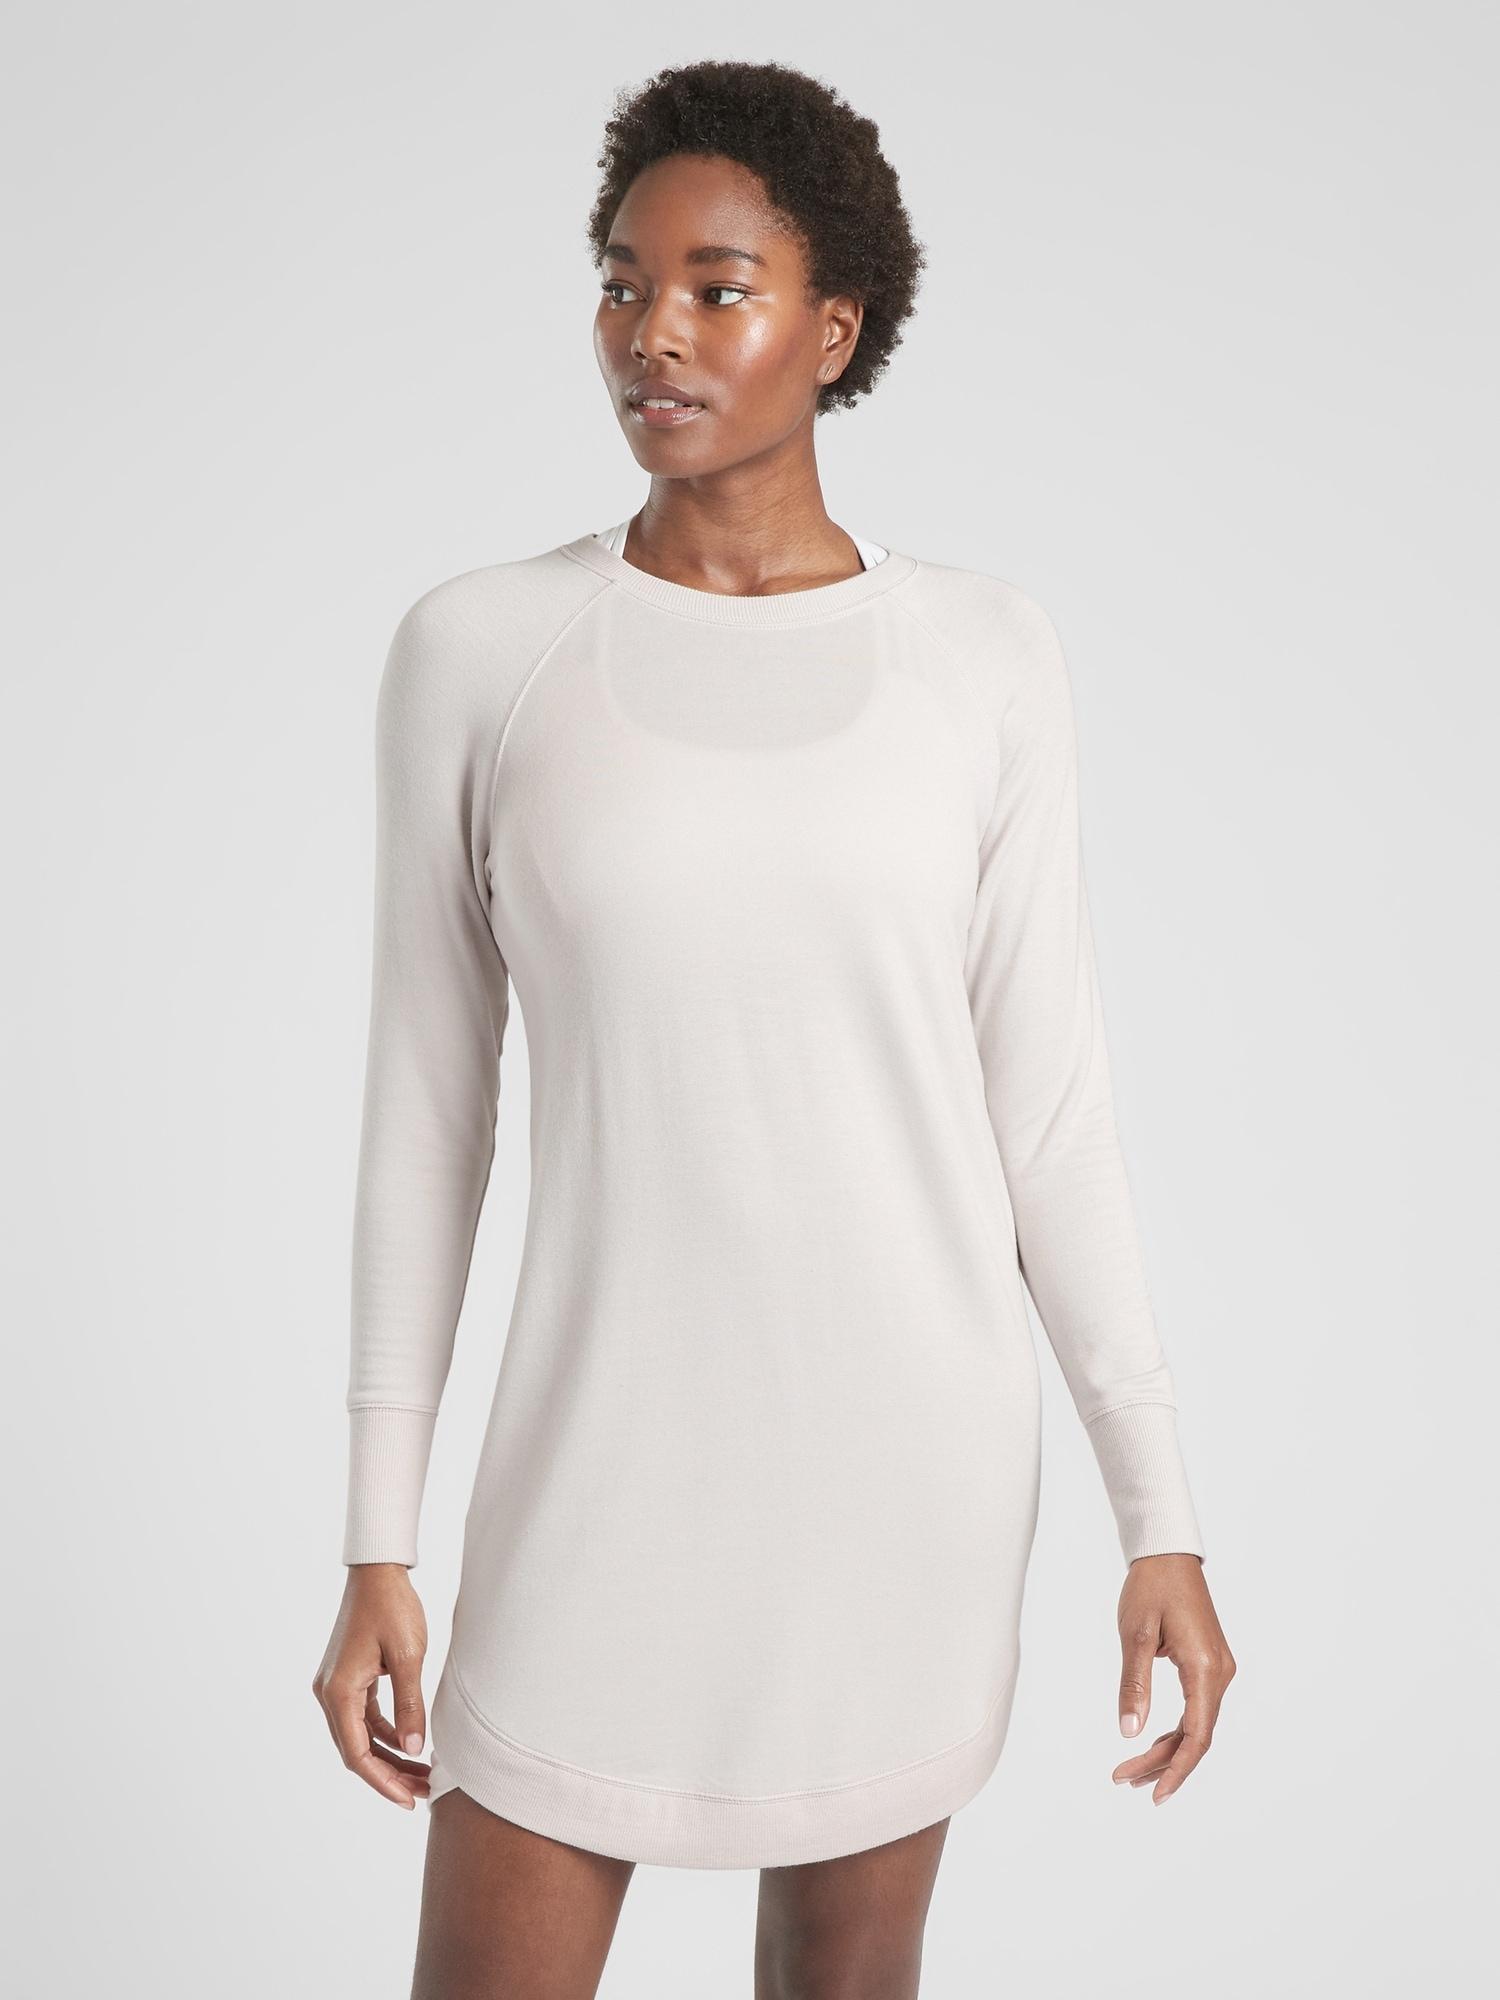 e21c7c19a54 Lyst - Athleta Mindset Sweatshirt Dress in Gray